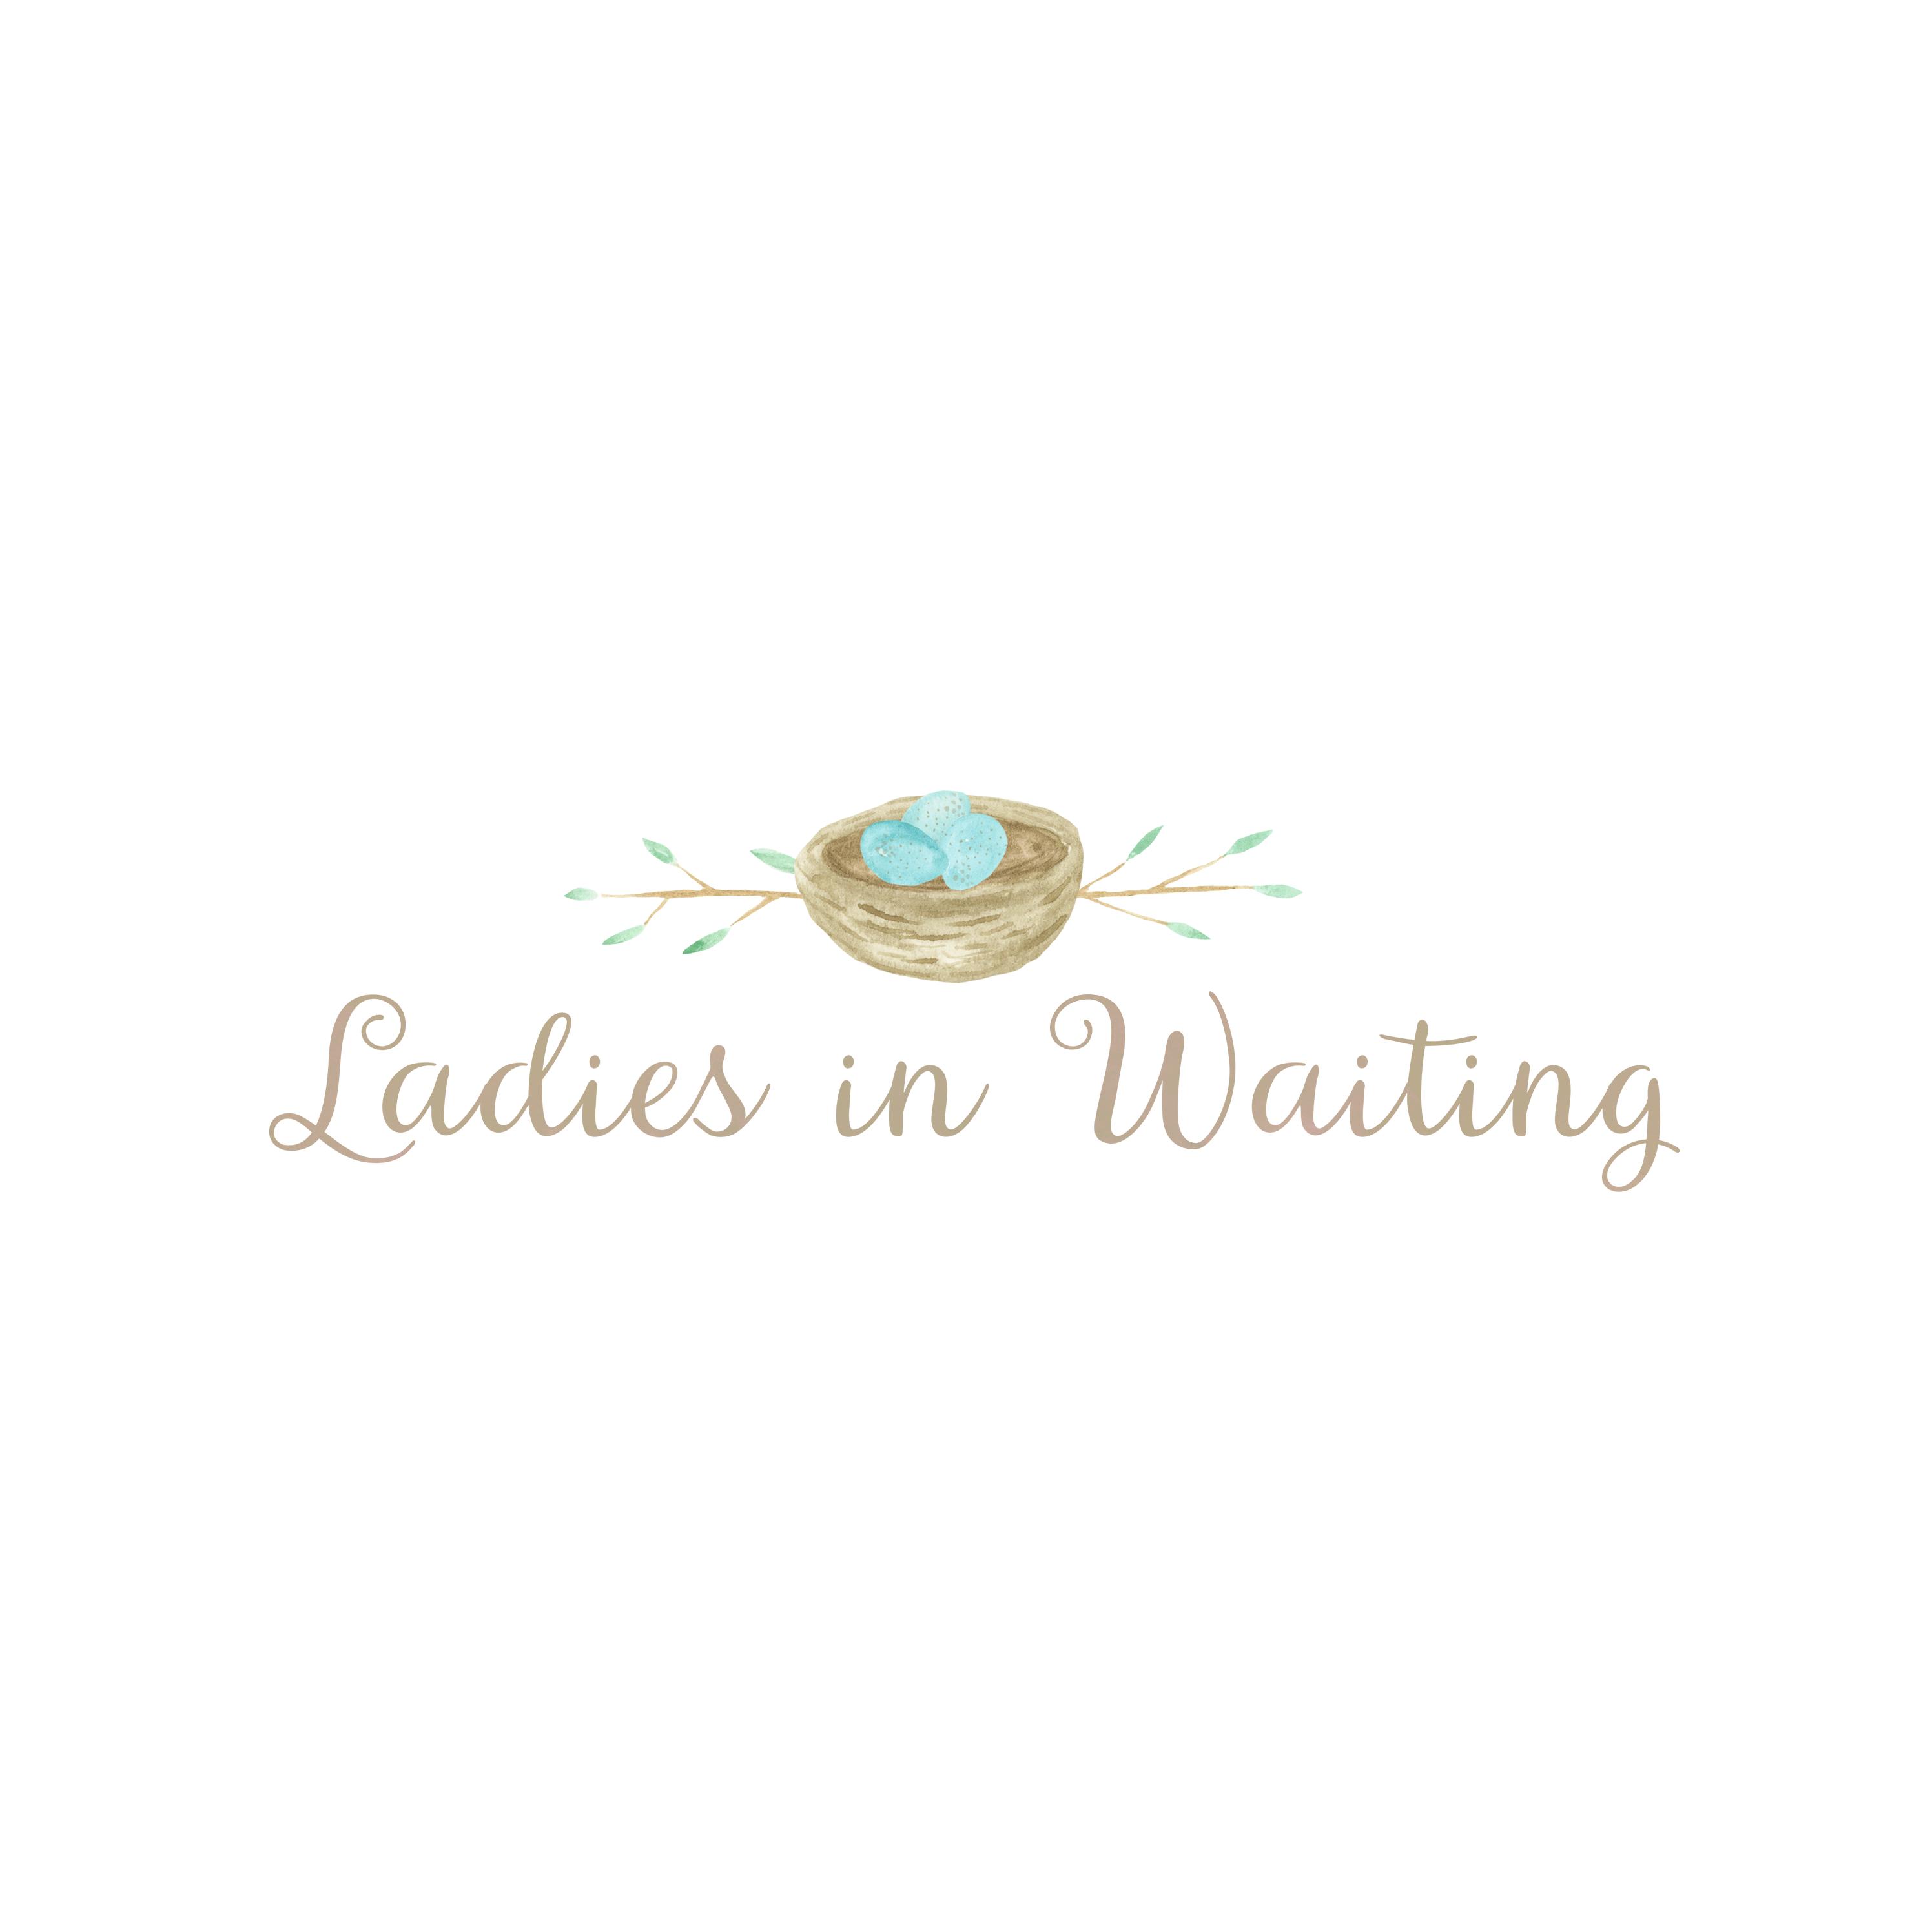 ladies in waiting shreveport